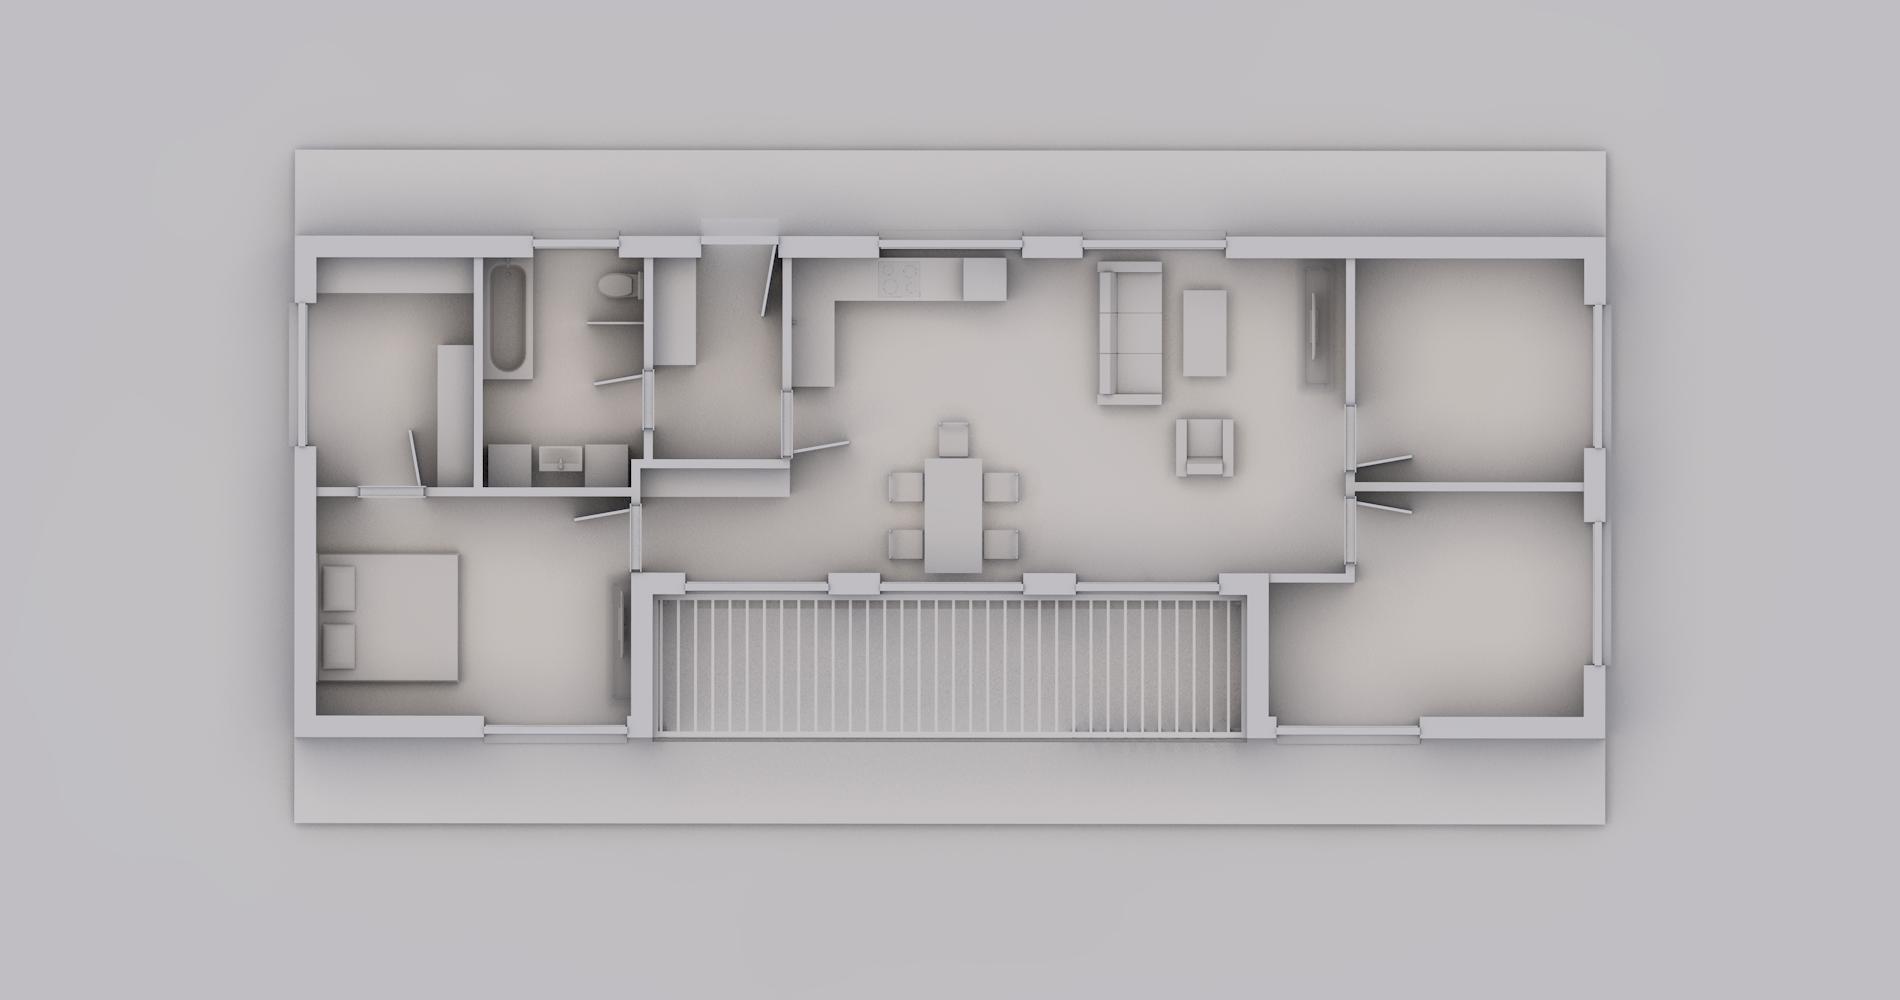 Rodinný dům U111 4+kk 19